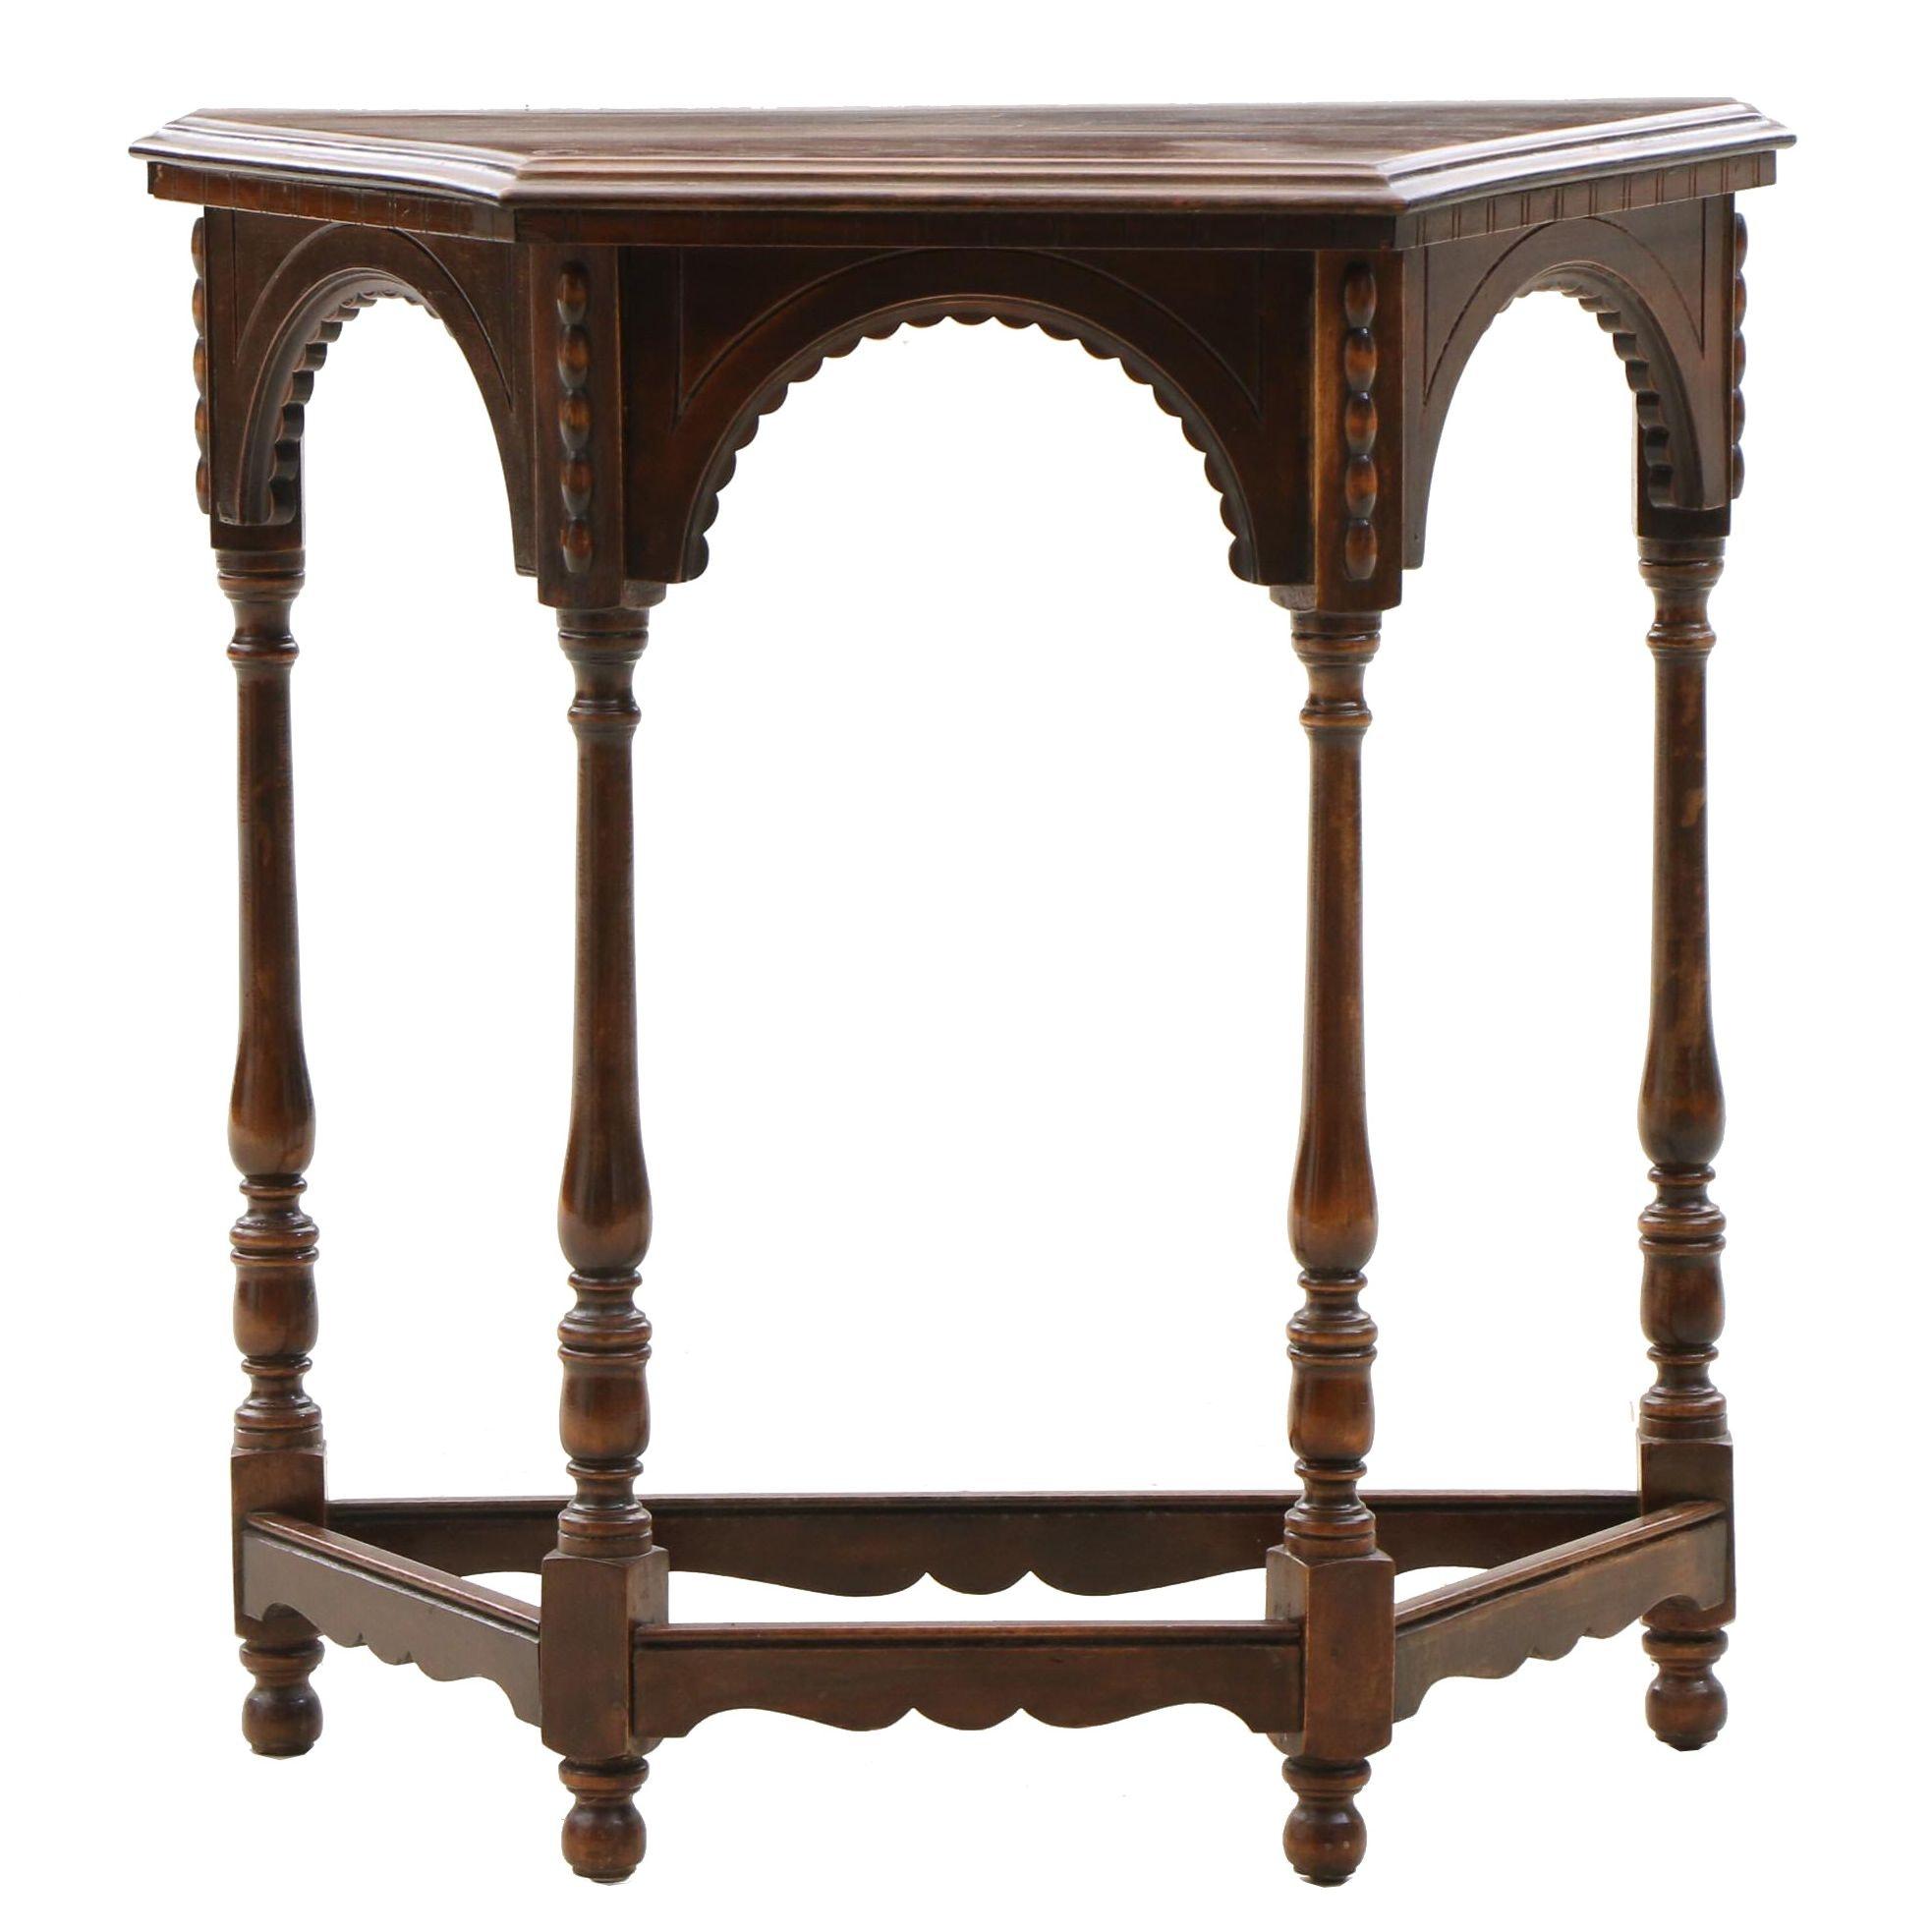 Renaissance Revival Walnut Accent Table by Jake Tennenbaum Furniture